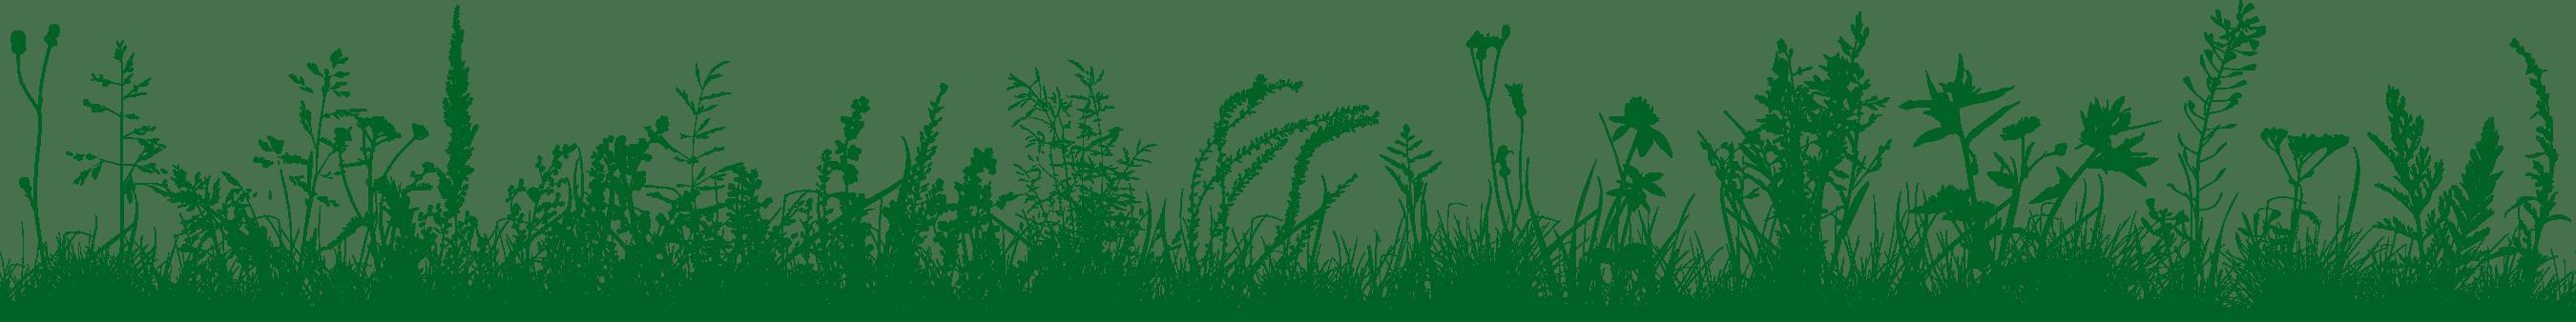 connemara meadow art 006225